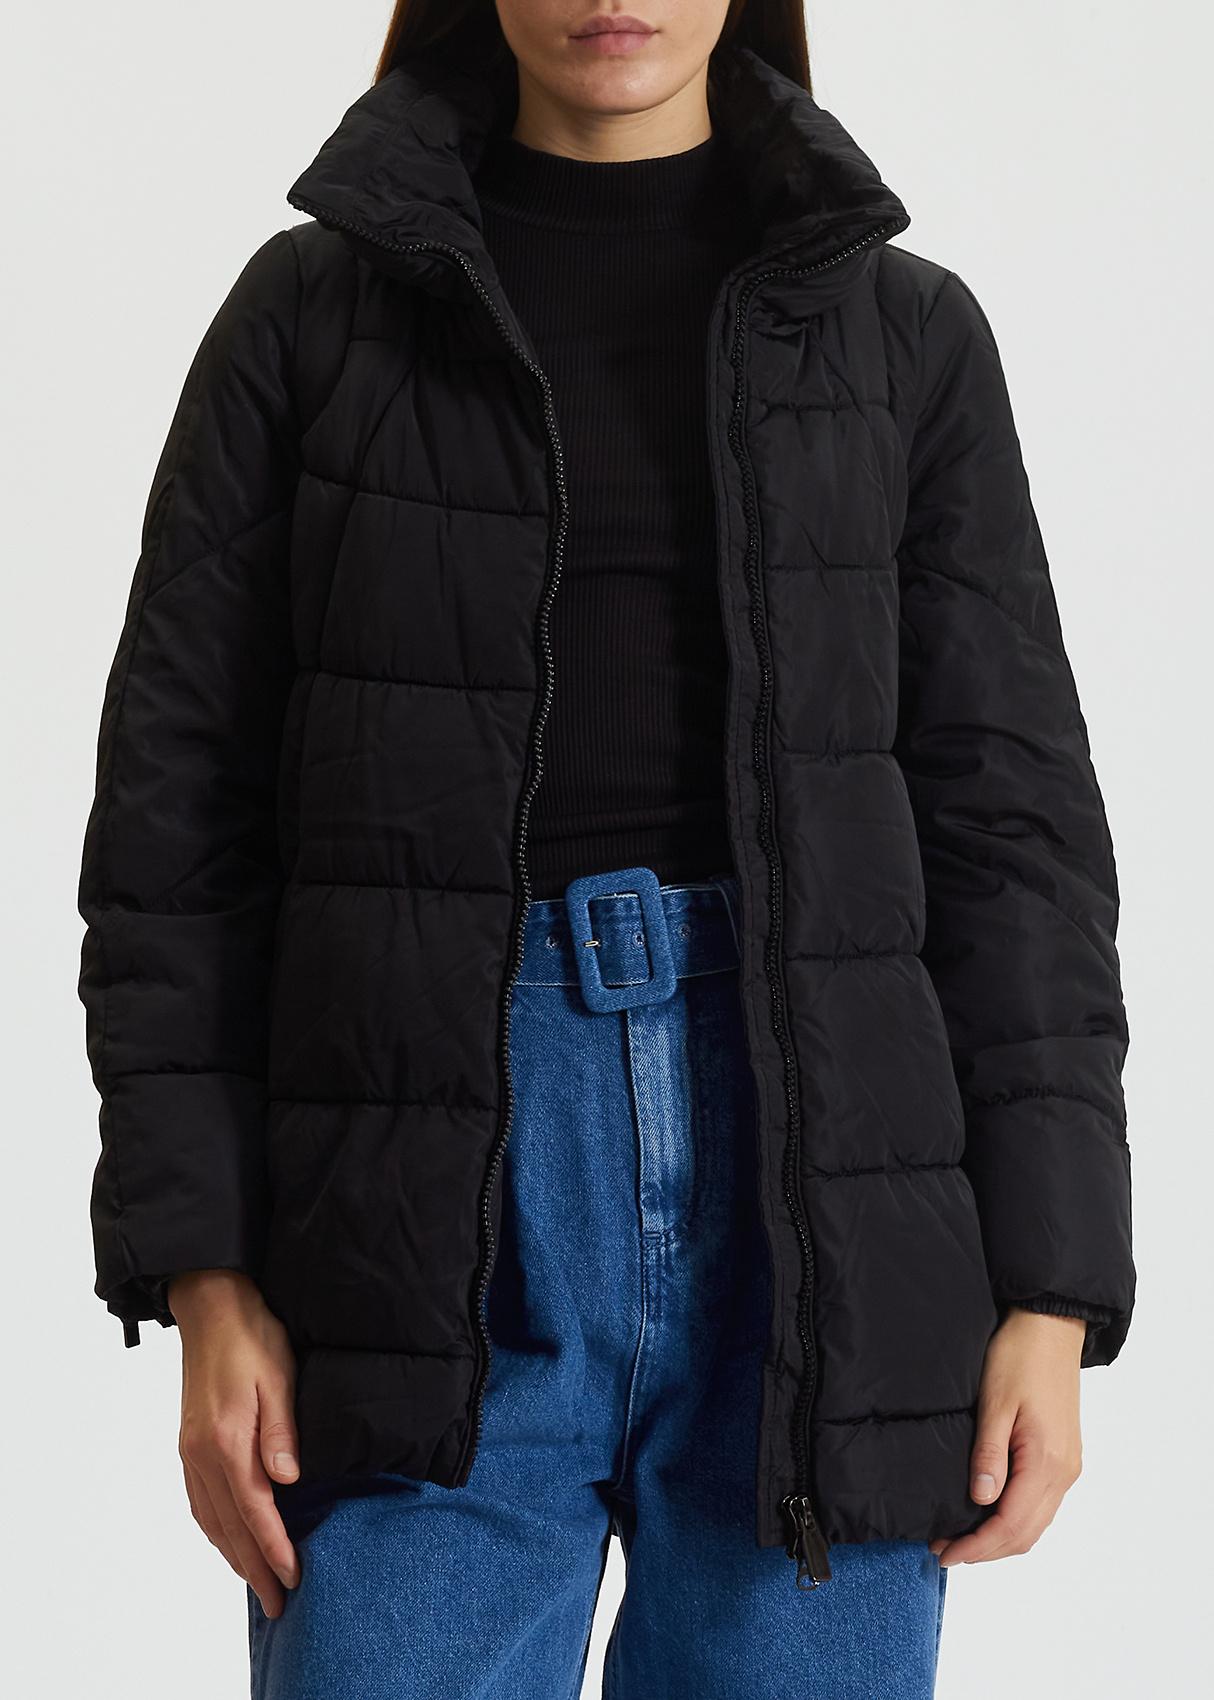 Куртка Trussardi Collection черного цвета